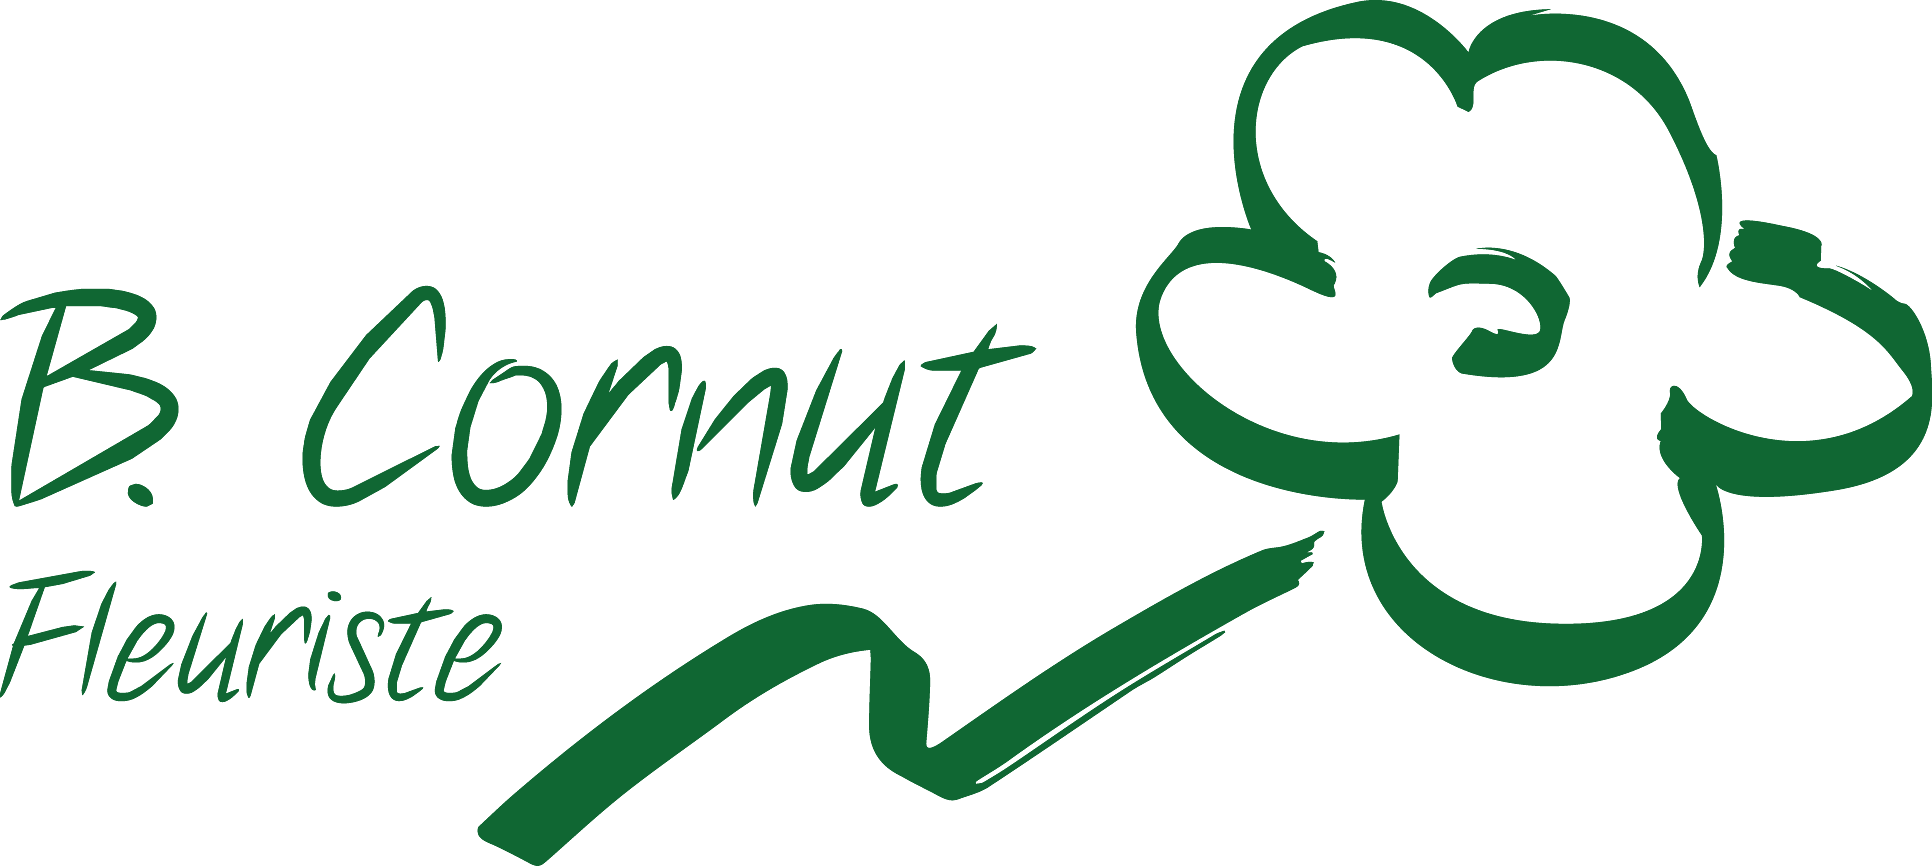 B. Cornut Fleuriste